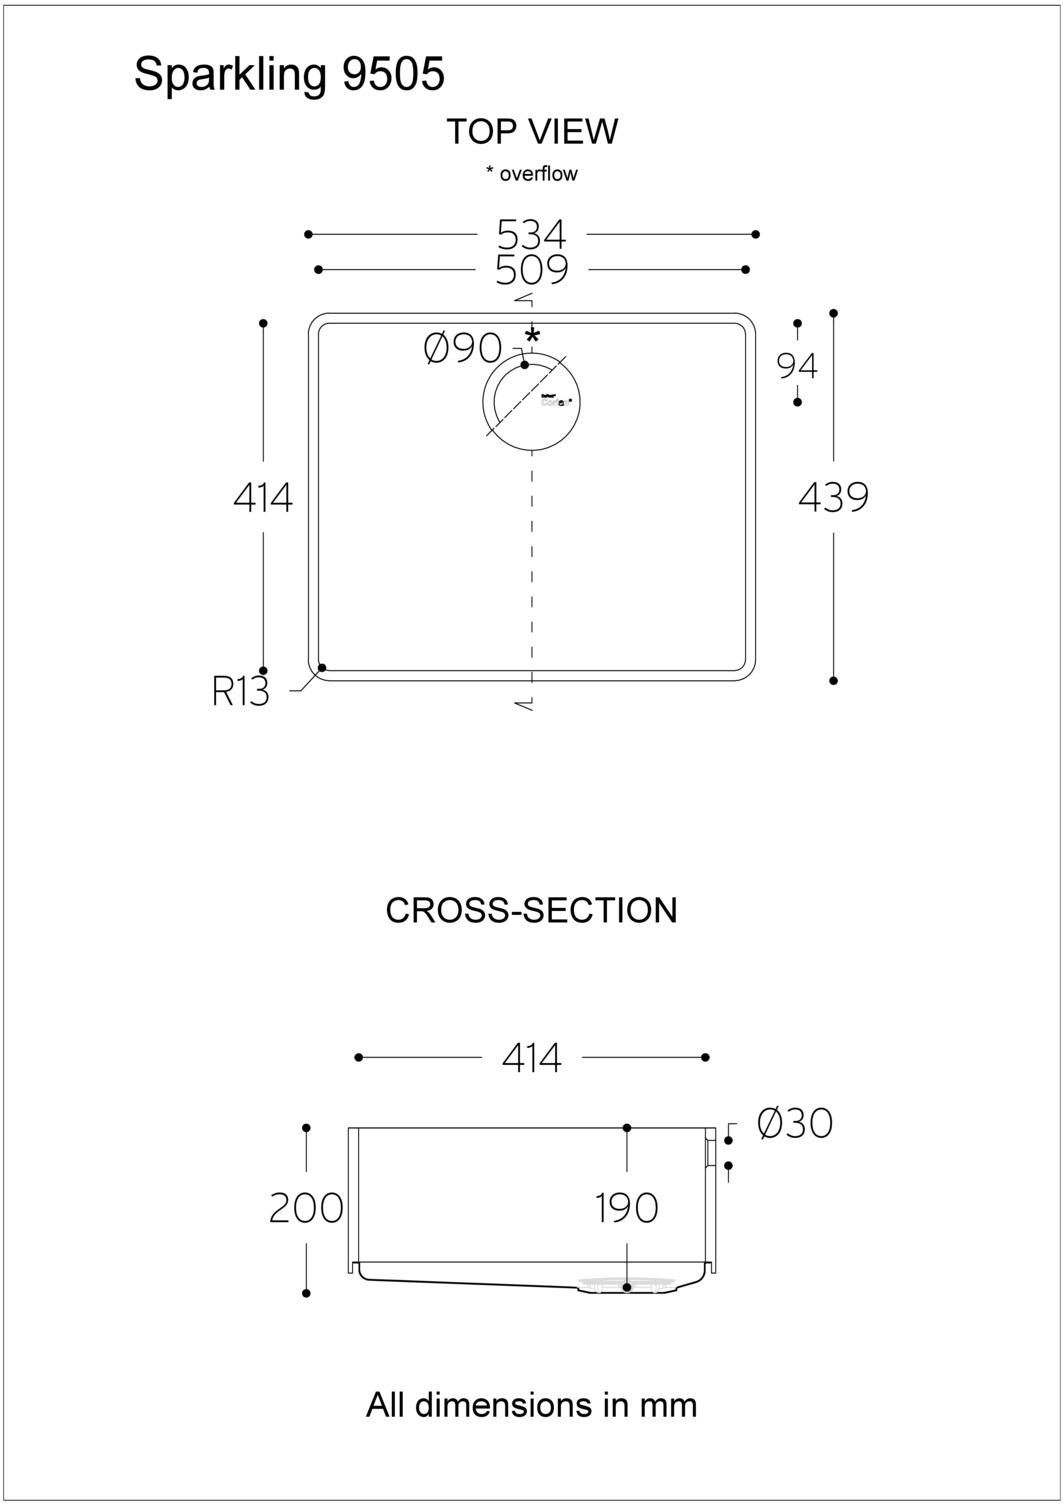 DUPONT_CORIAN_SPARKLING9505_2D_PDF[0]